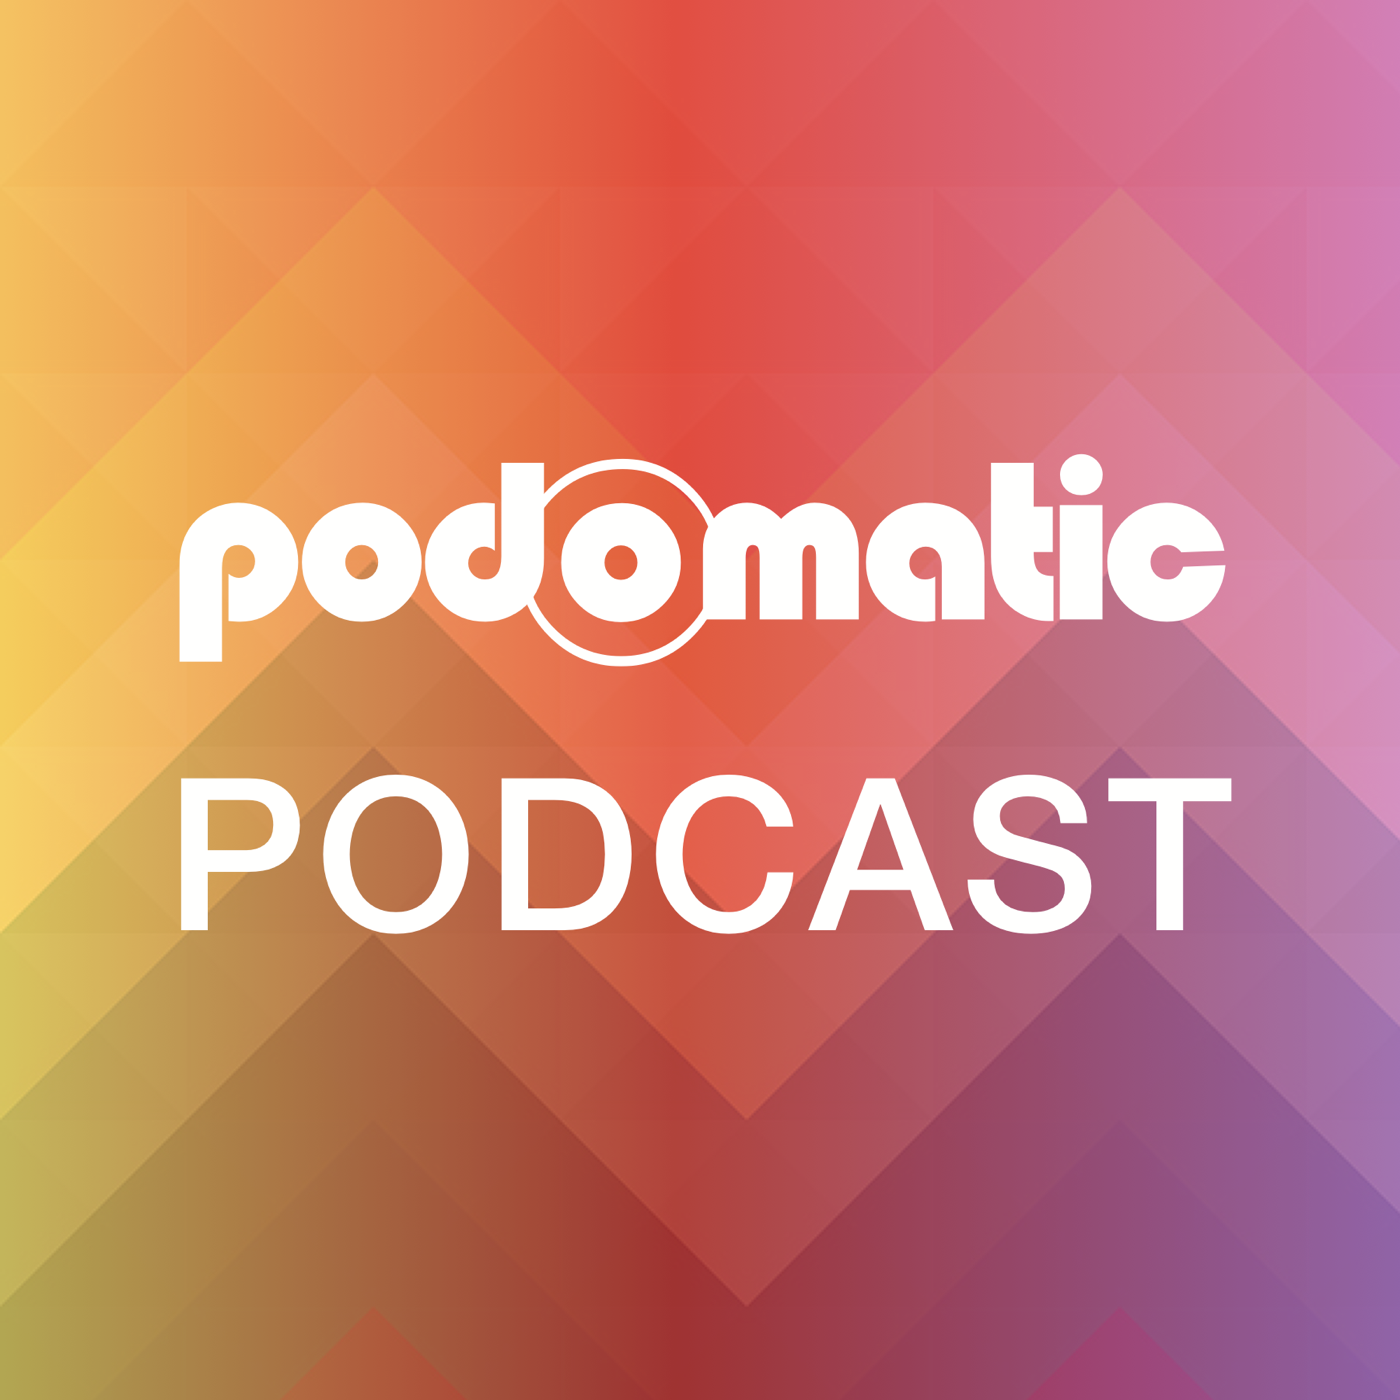 ivanayariel@gmail.com's Podcast